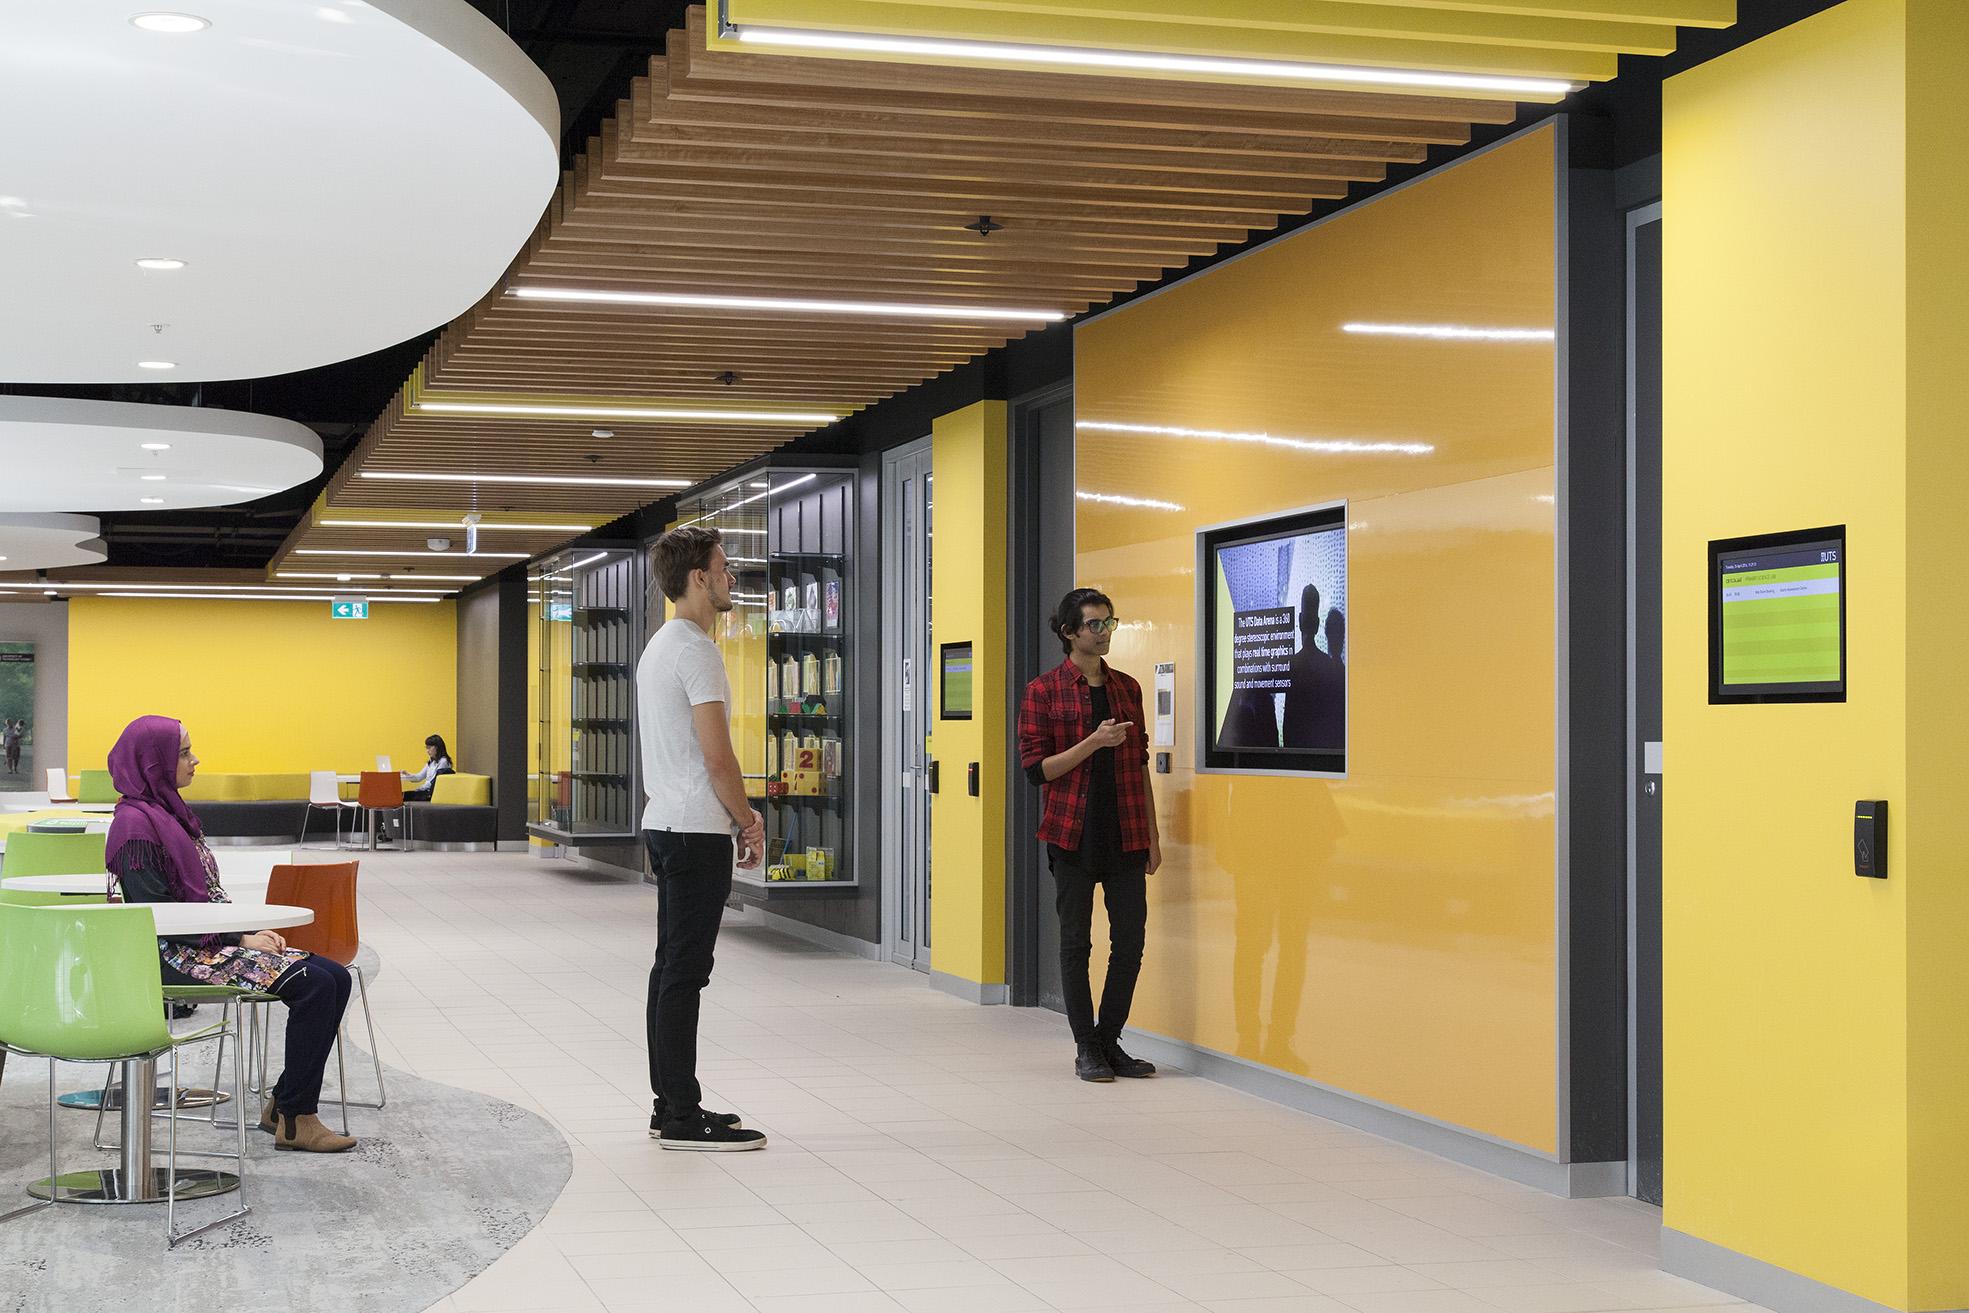 UTS Building 10 FASS & FoH Lobby – Gardner Wetherill GW 2